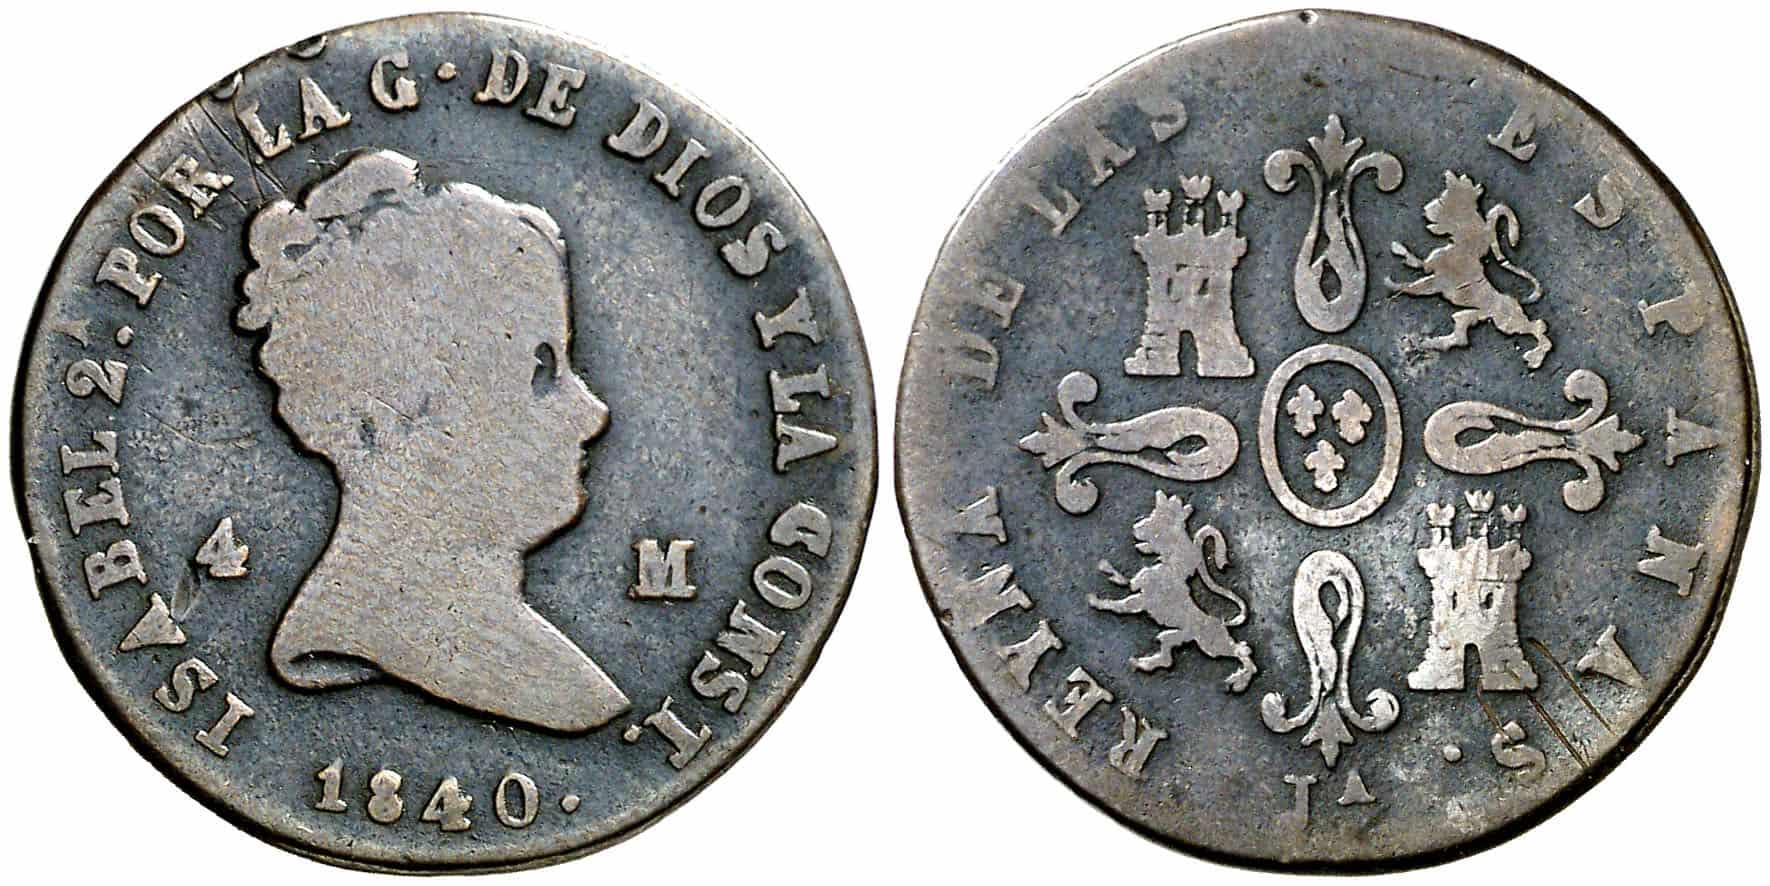 4 maravedís Jubia 1840